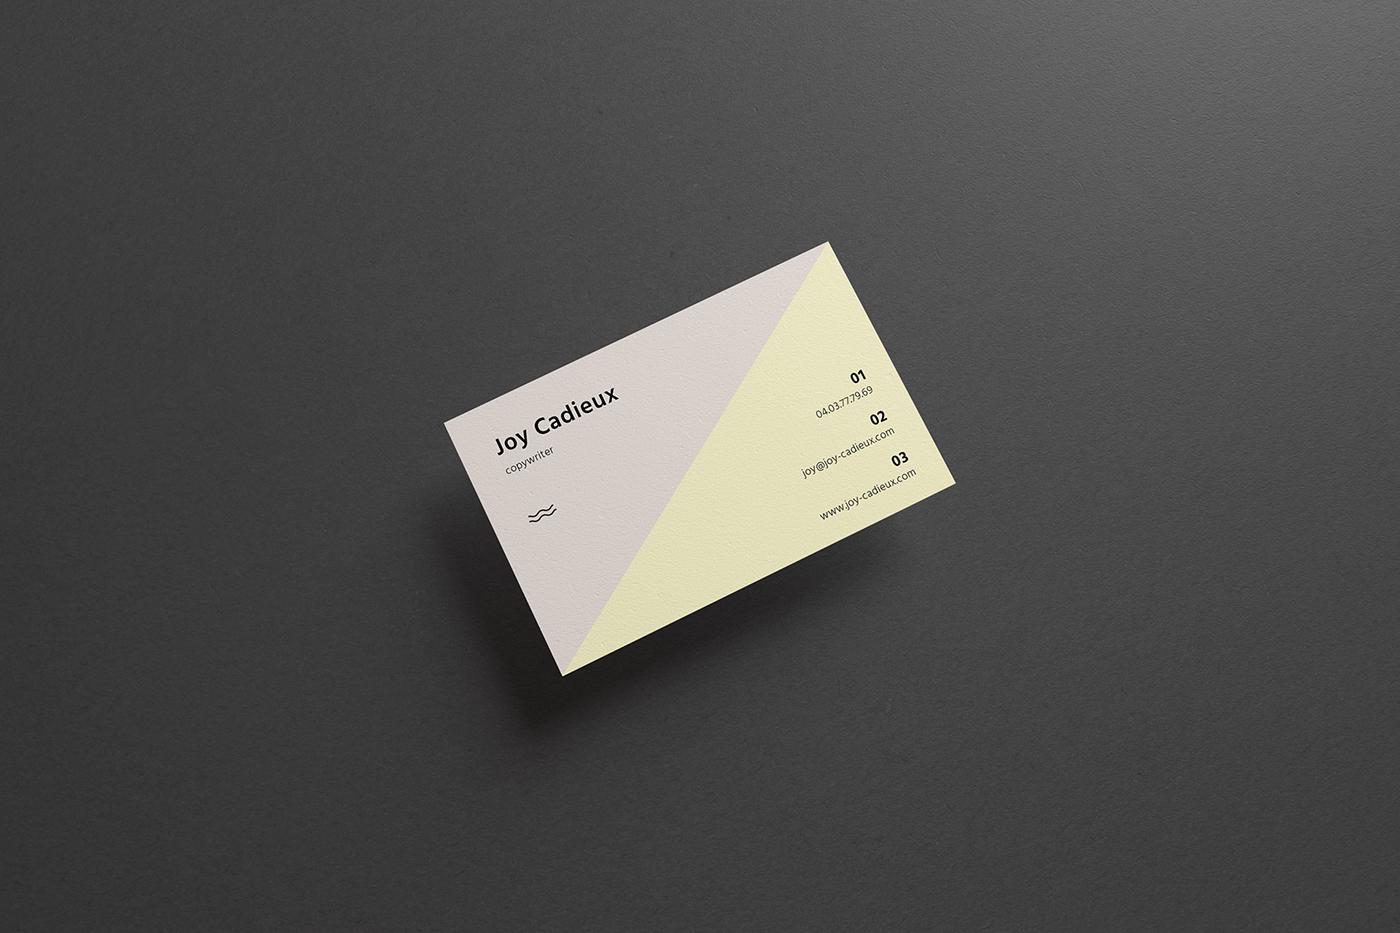 blank business card design mockup psd file free download - HD1400×933